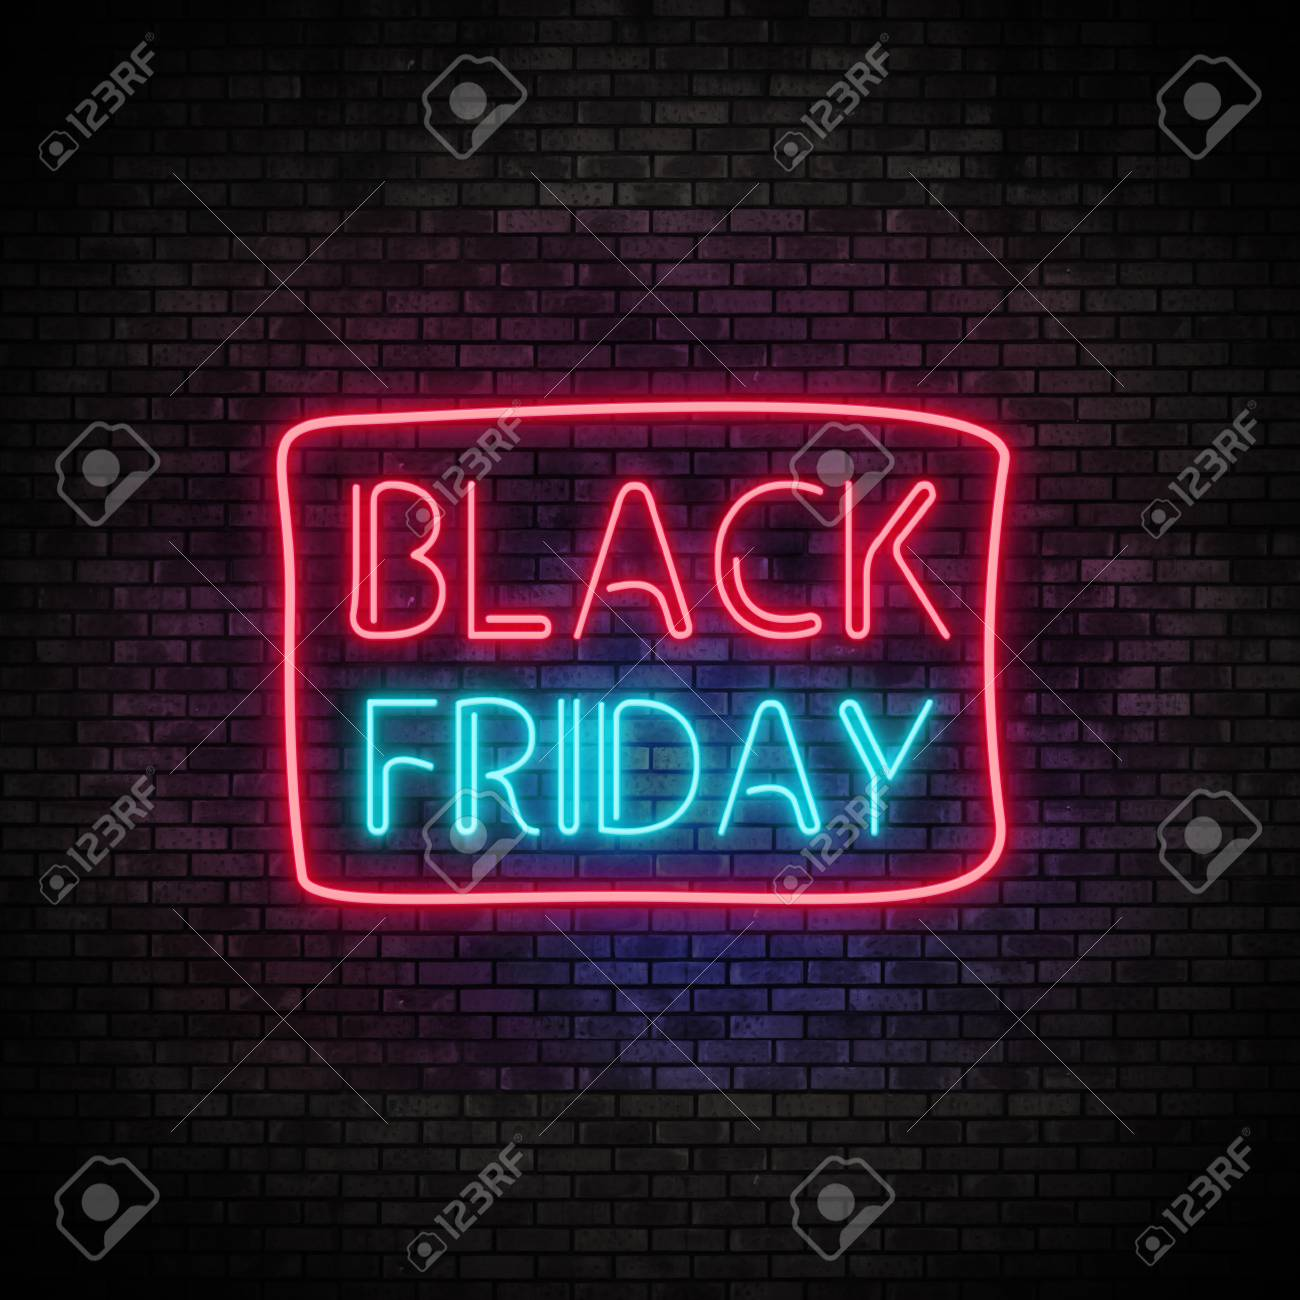 Black Friday Neon Light on Brick Wall - 88656928